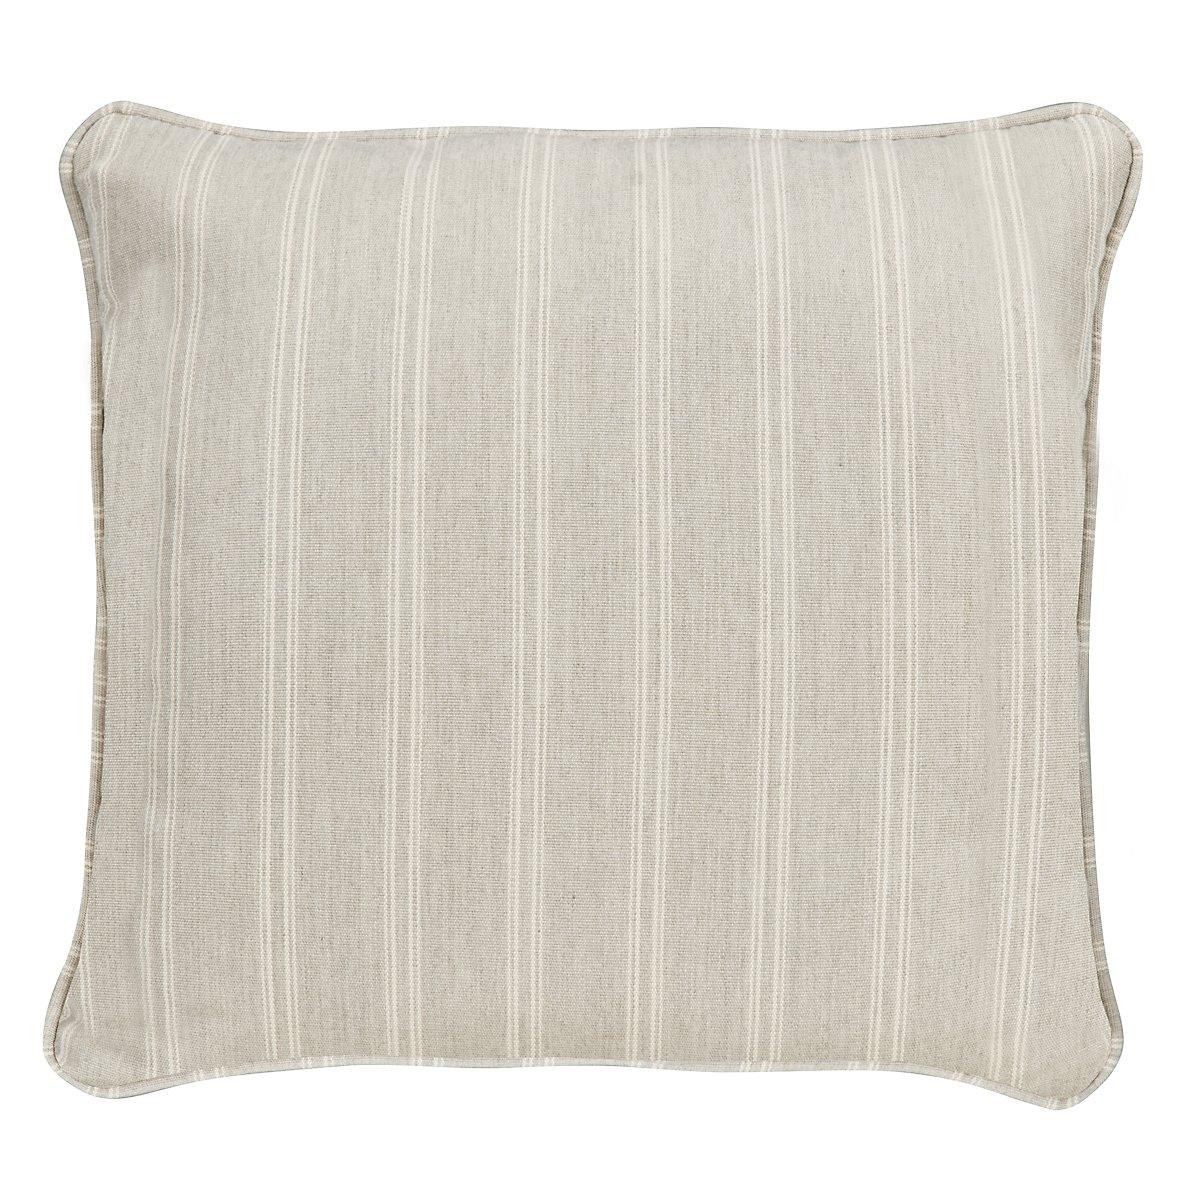 "Espadrille Light Gray Fabric 18"" Accent Pillow"